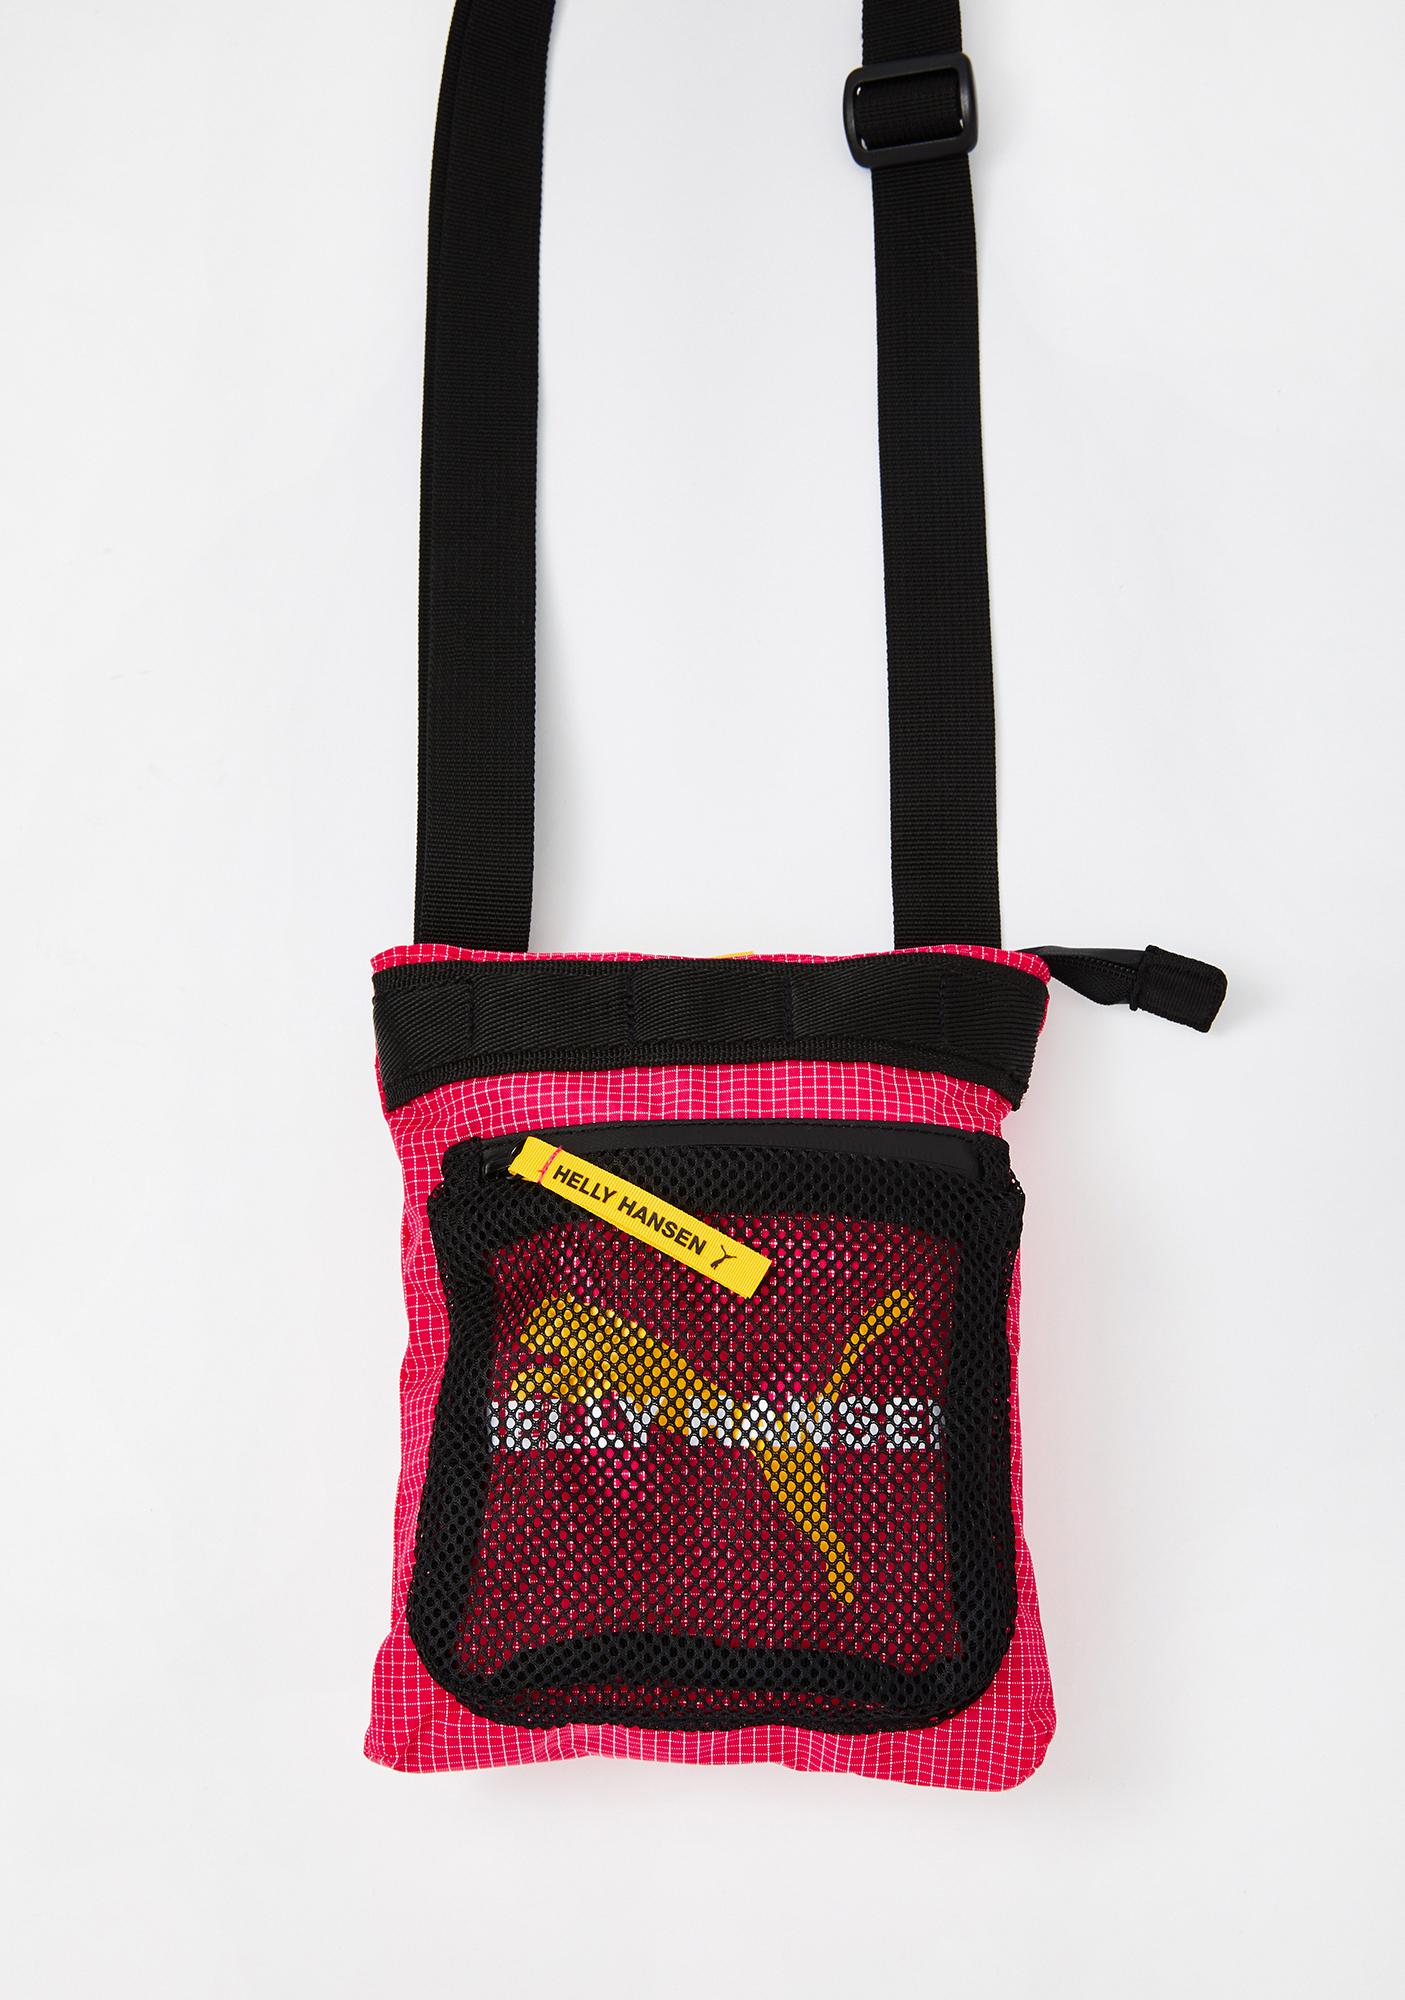 PUMA X Helly Hansen Portable Shoulder Bag